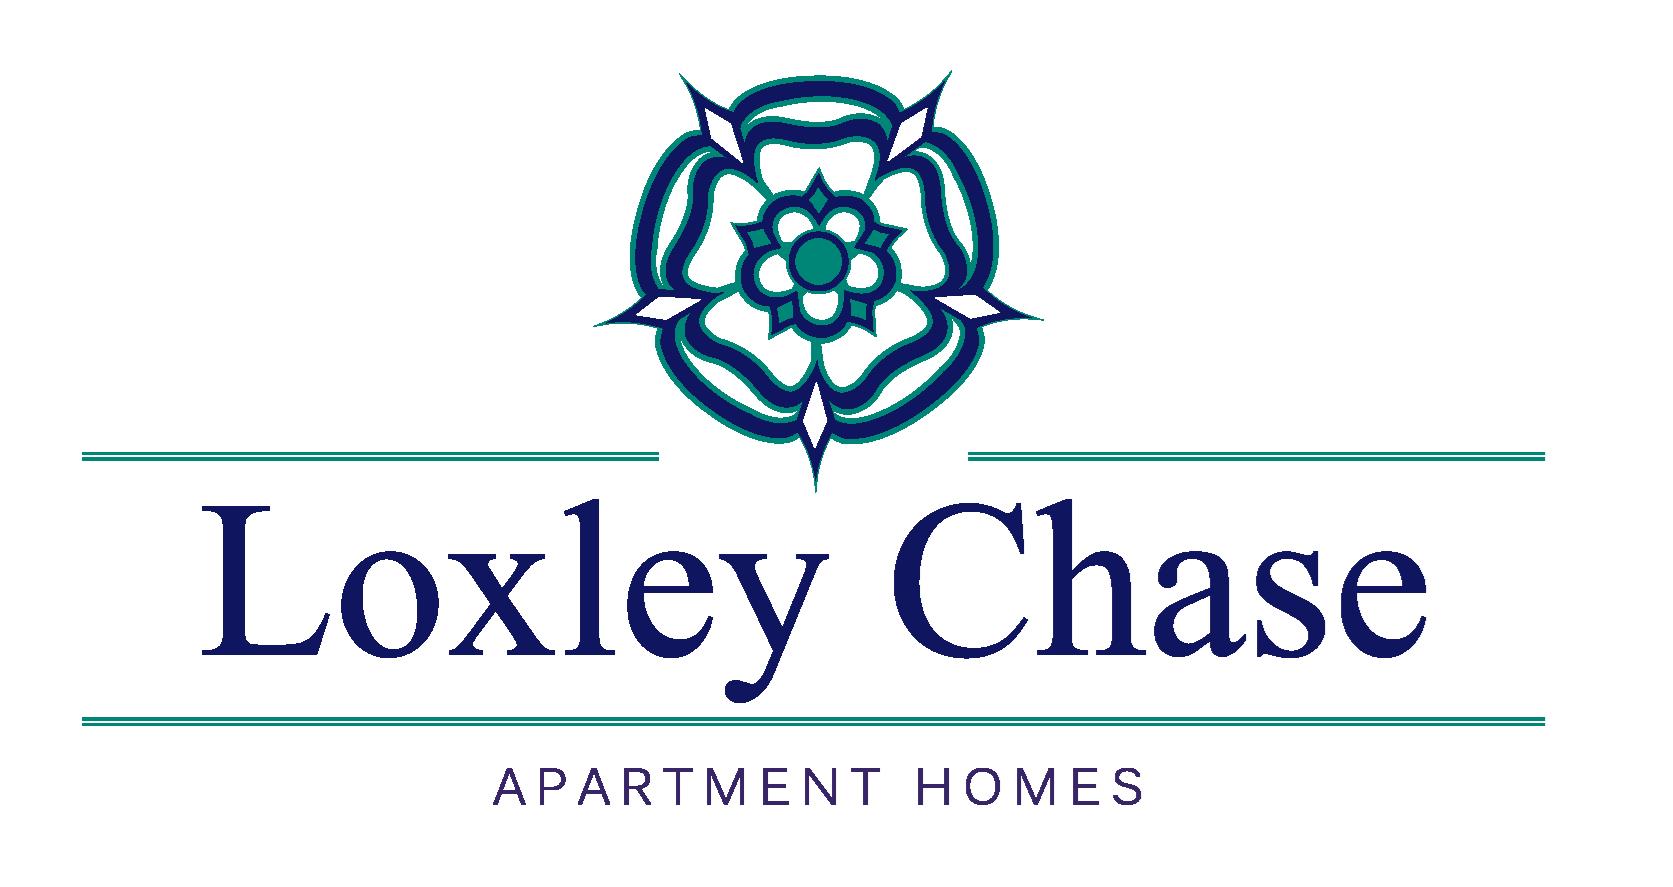 Loxley Chase, Winston-Salem